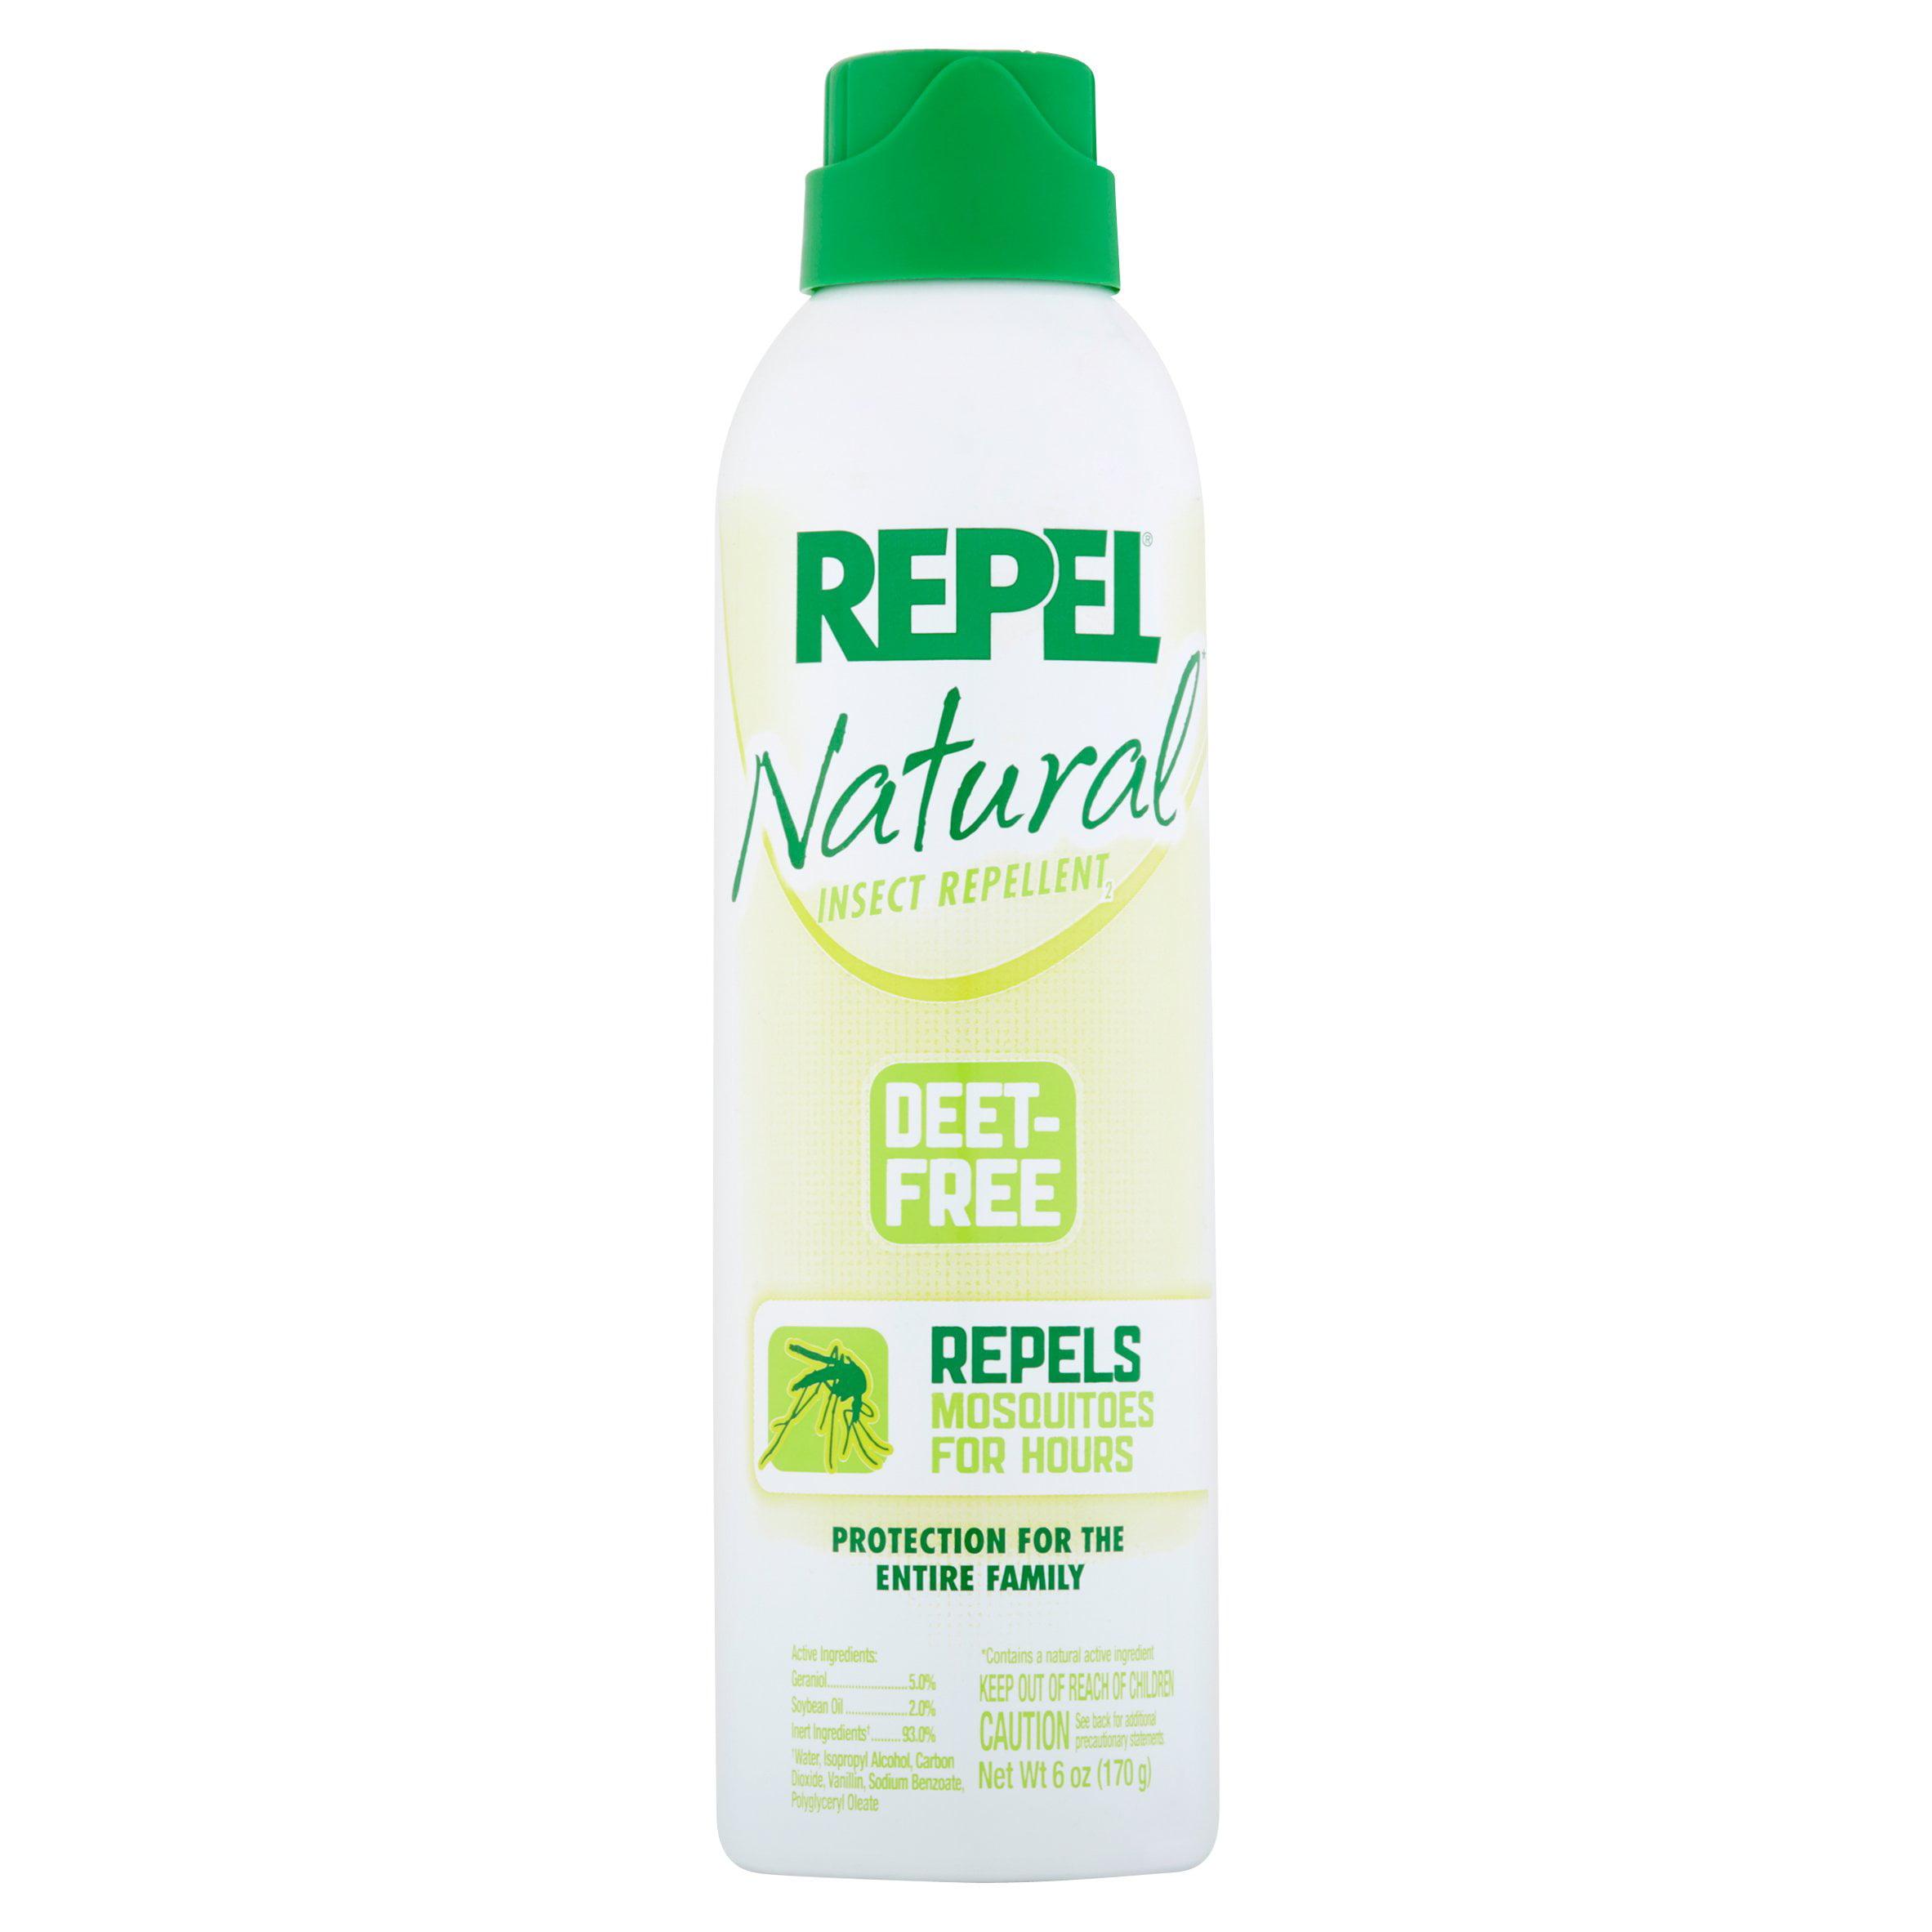 Repel Natural Mosquito Repellent Aerosol Spray 6 Ounce Walmart